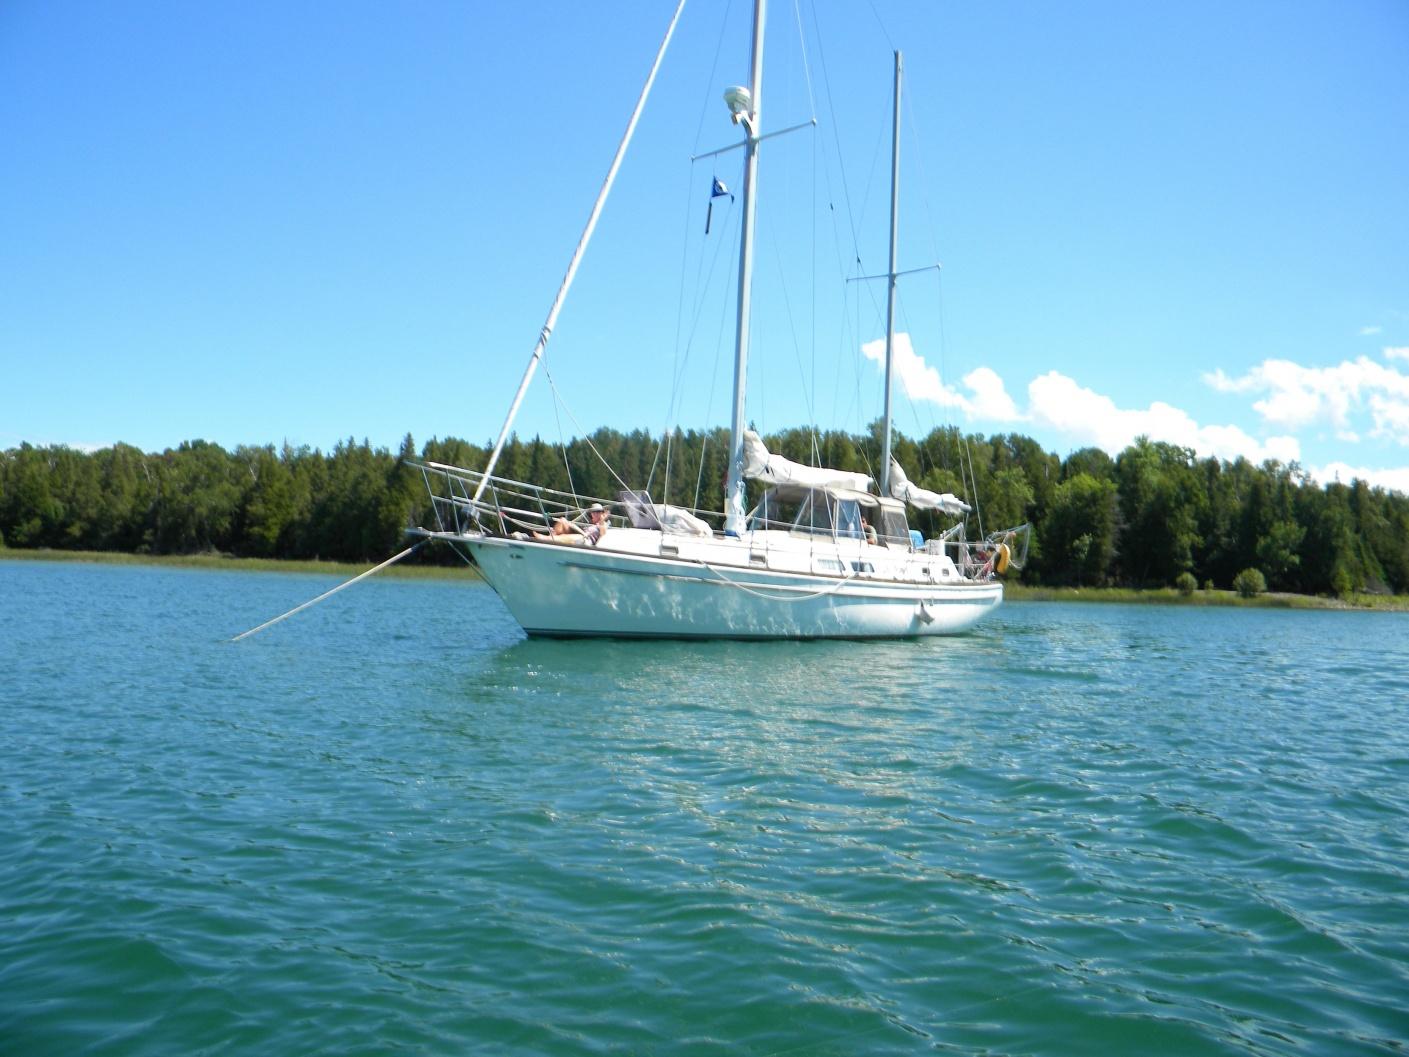 Click image for larger version  Name:Aventura at Harbor island.jpg Views:153 Size:416.3 KB ID:46897